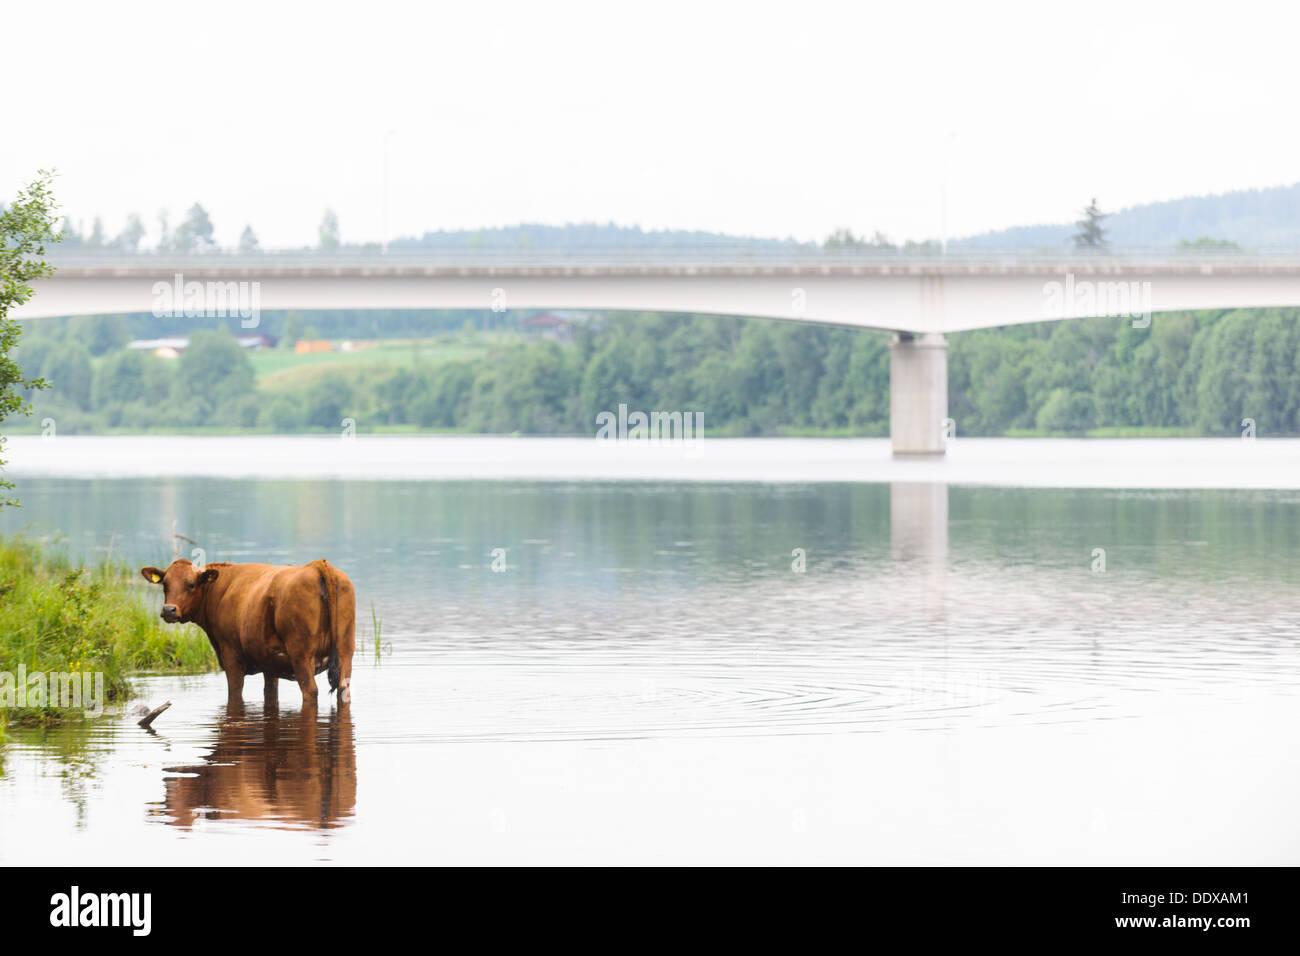 Cow standing in river, Dalälven, Dalarna, Sweden - Stock Image